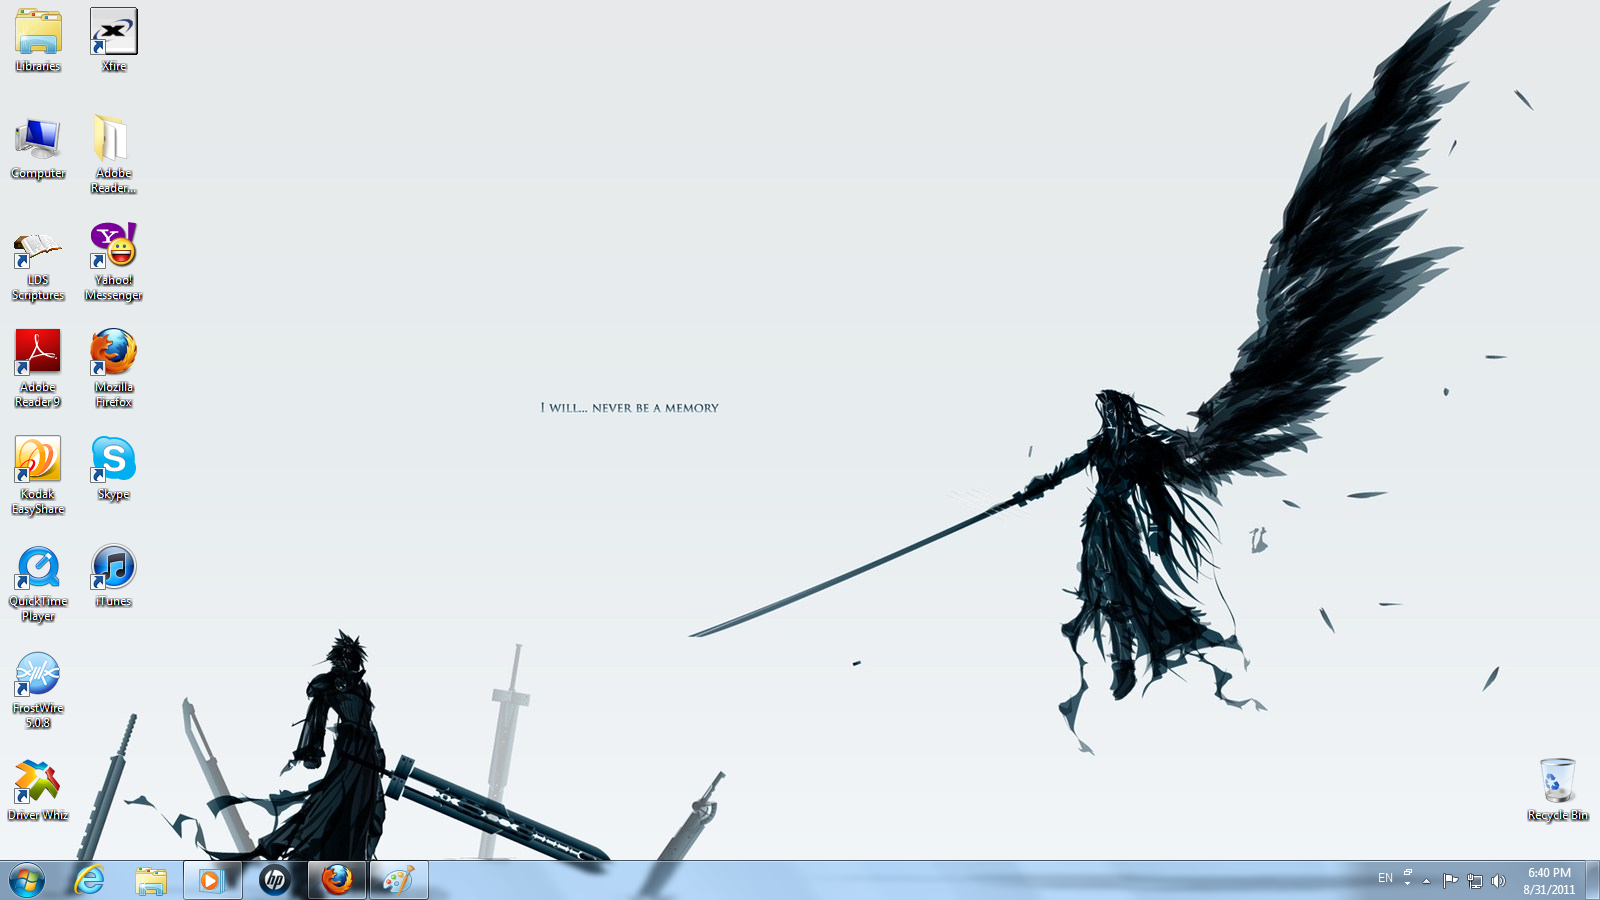 Click image for larger version  Name:desktop 2.png Views:109 Size:611.2 KB ID:49918